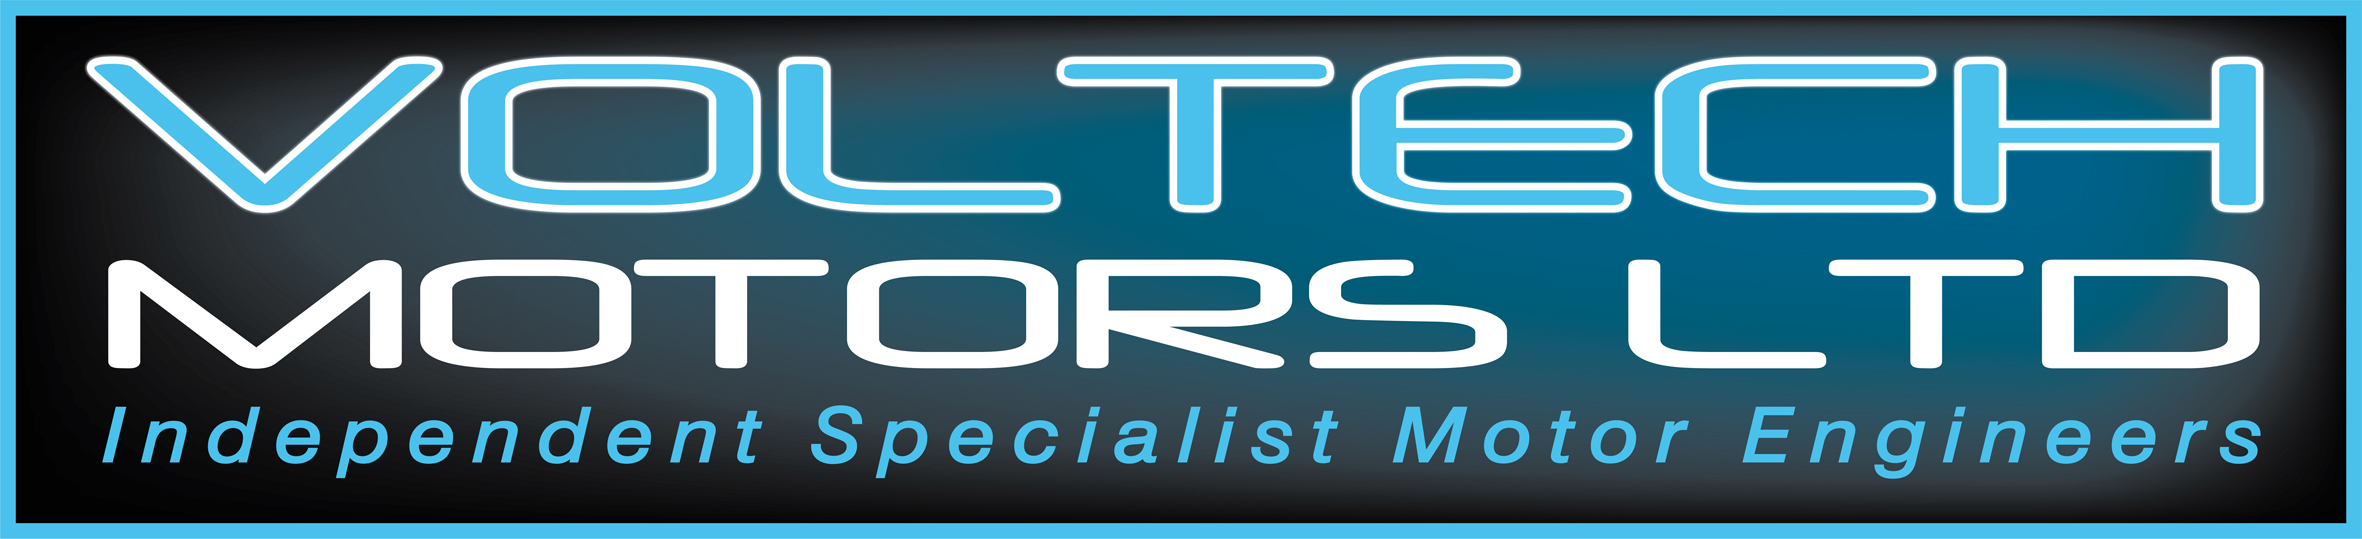 VOLTECH MOTORS LTD Logo